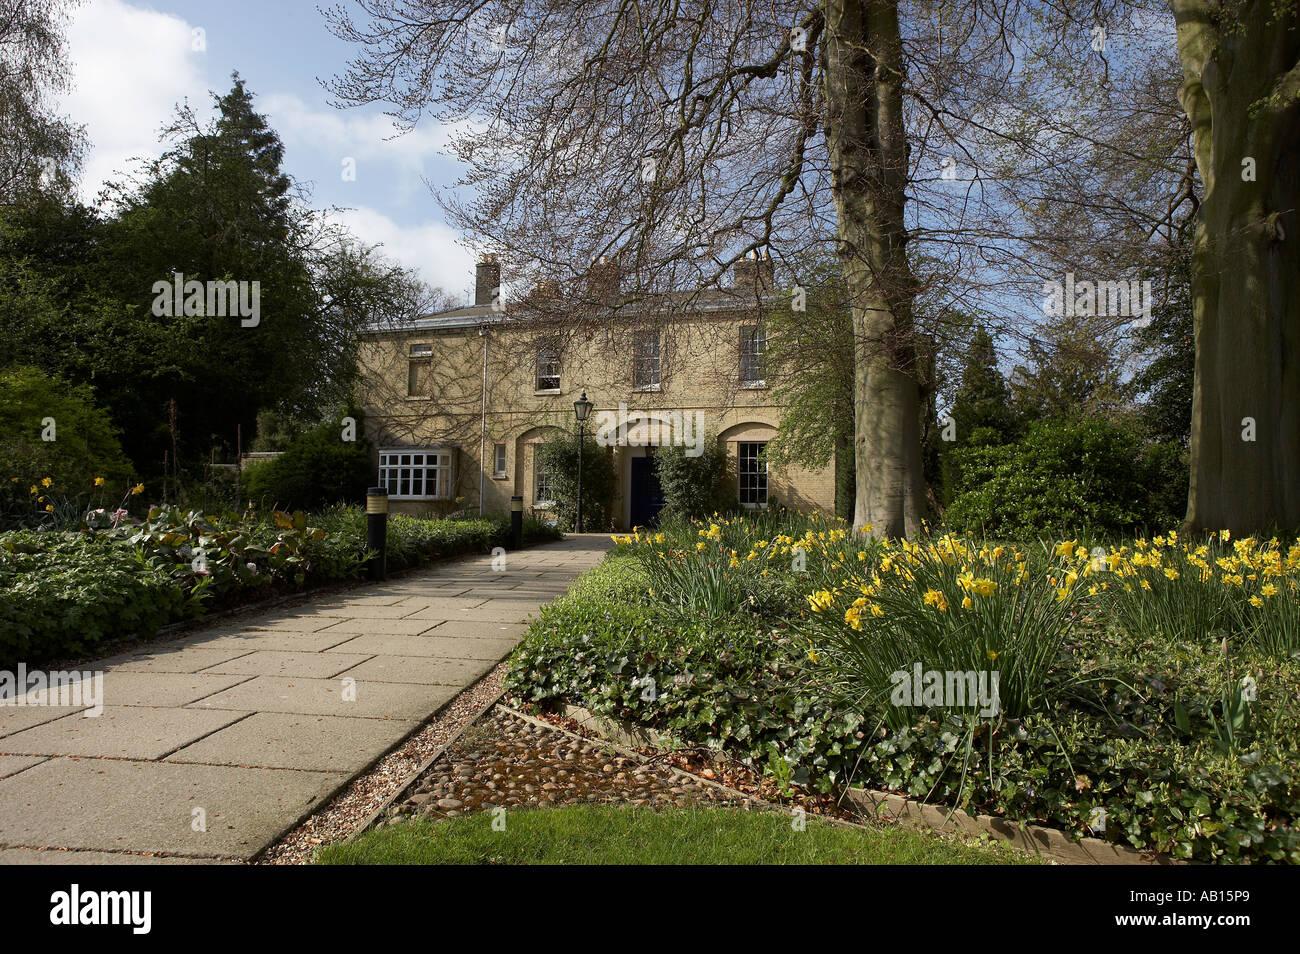 MASTERS LODGE FITZILLIAM COLLEGE CAMBRIDGE UNIVERSITY ENGLAND - Stock Image